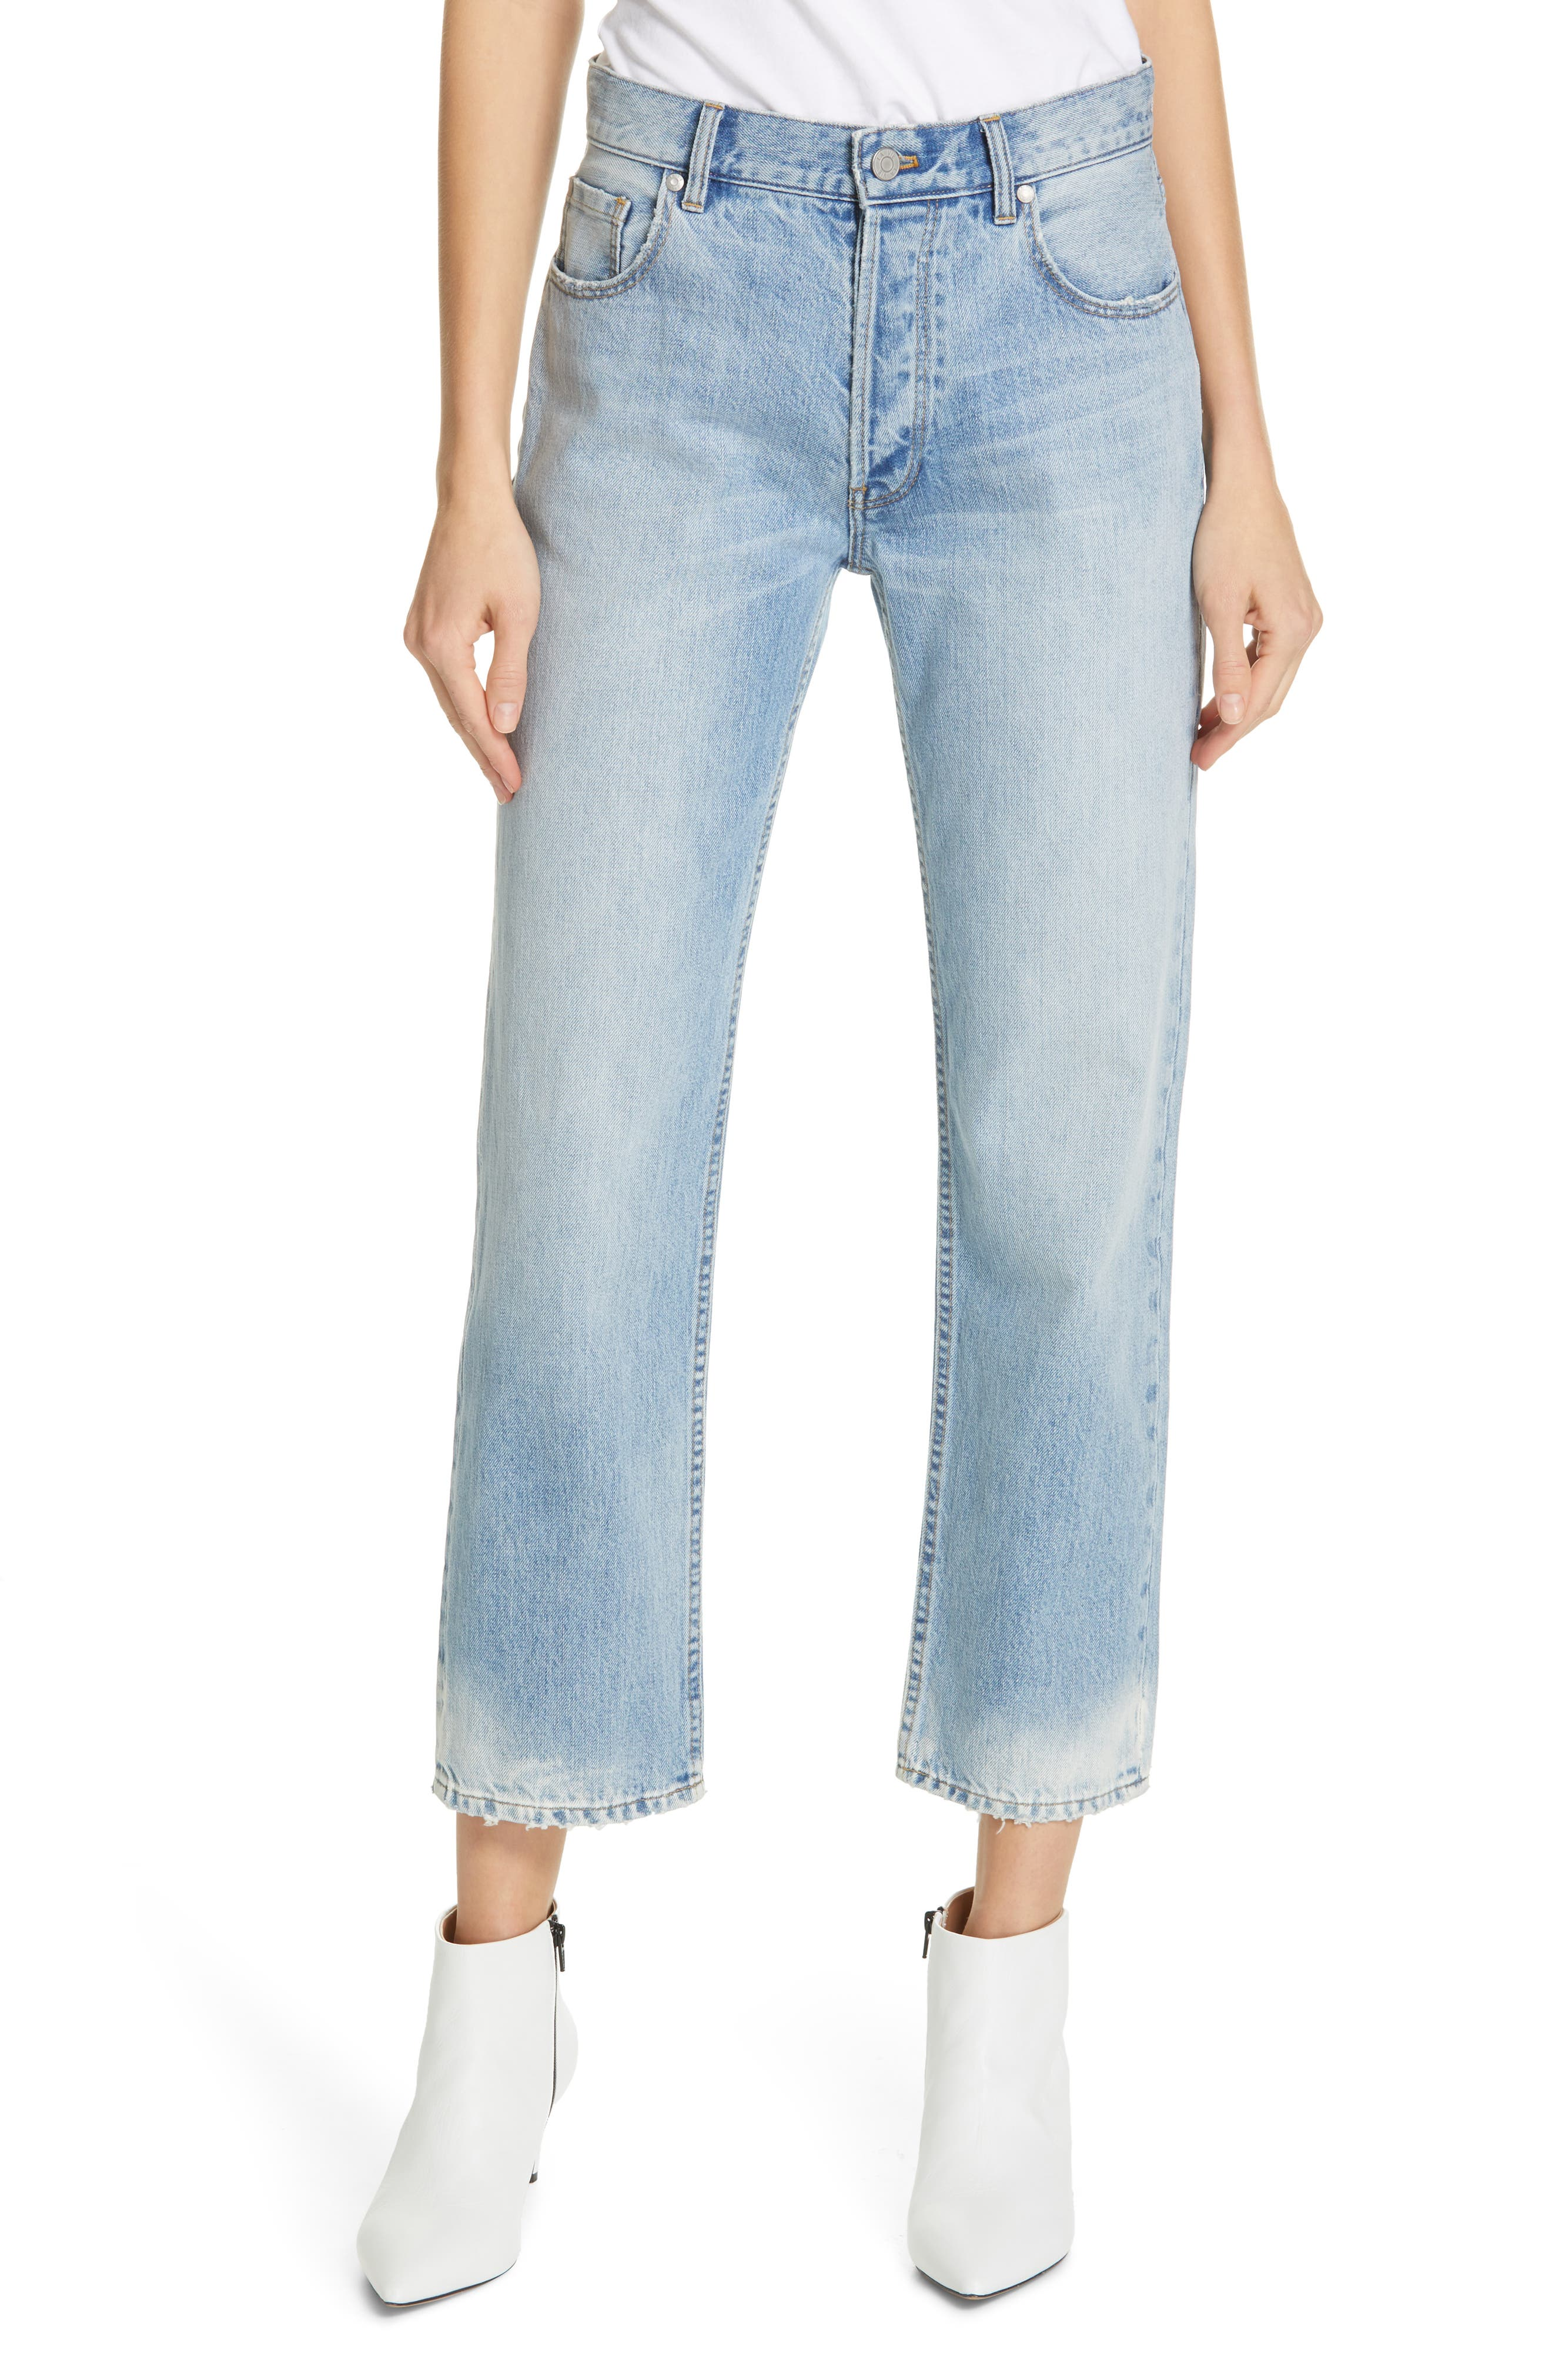 LA VIE REBECCA TAYLOR, Sylvie High Waist Jeans, Main thumbnail 1, color, CHANTAL WASH